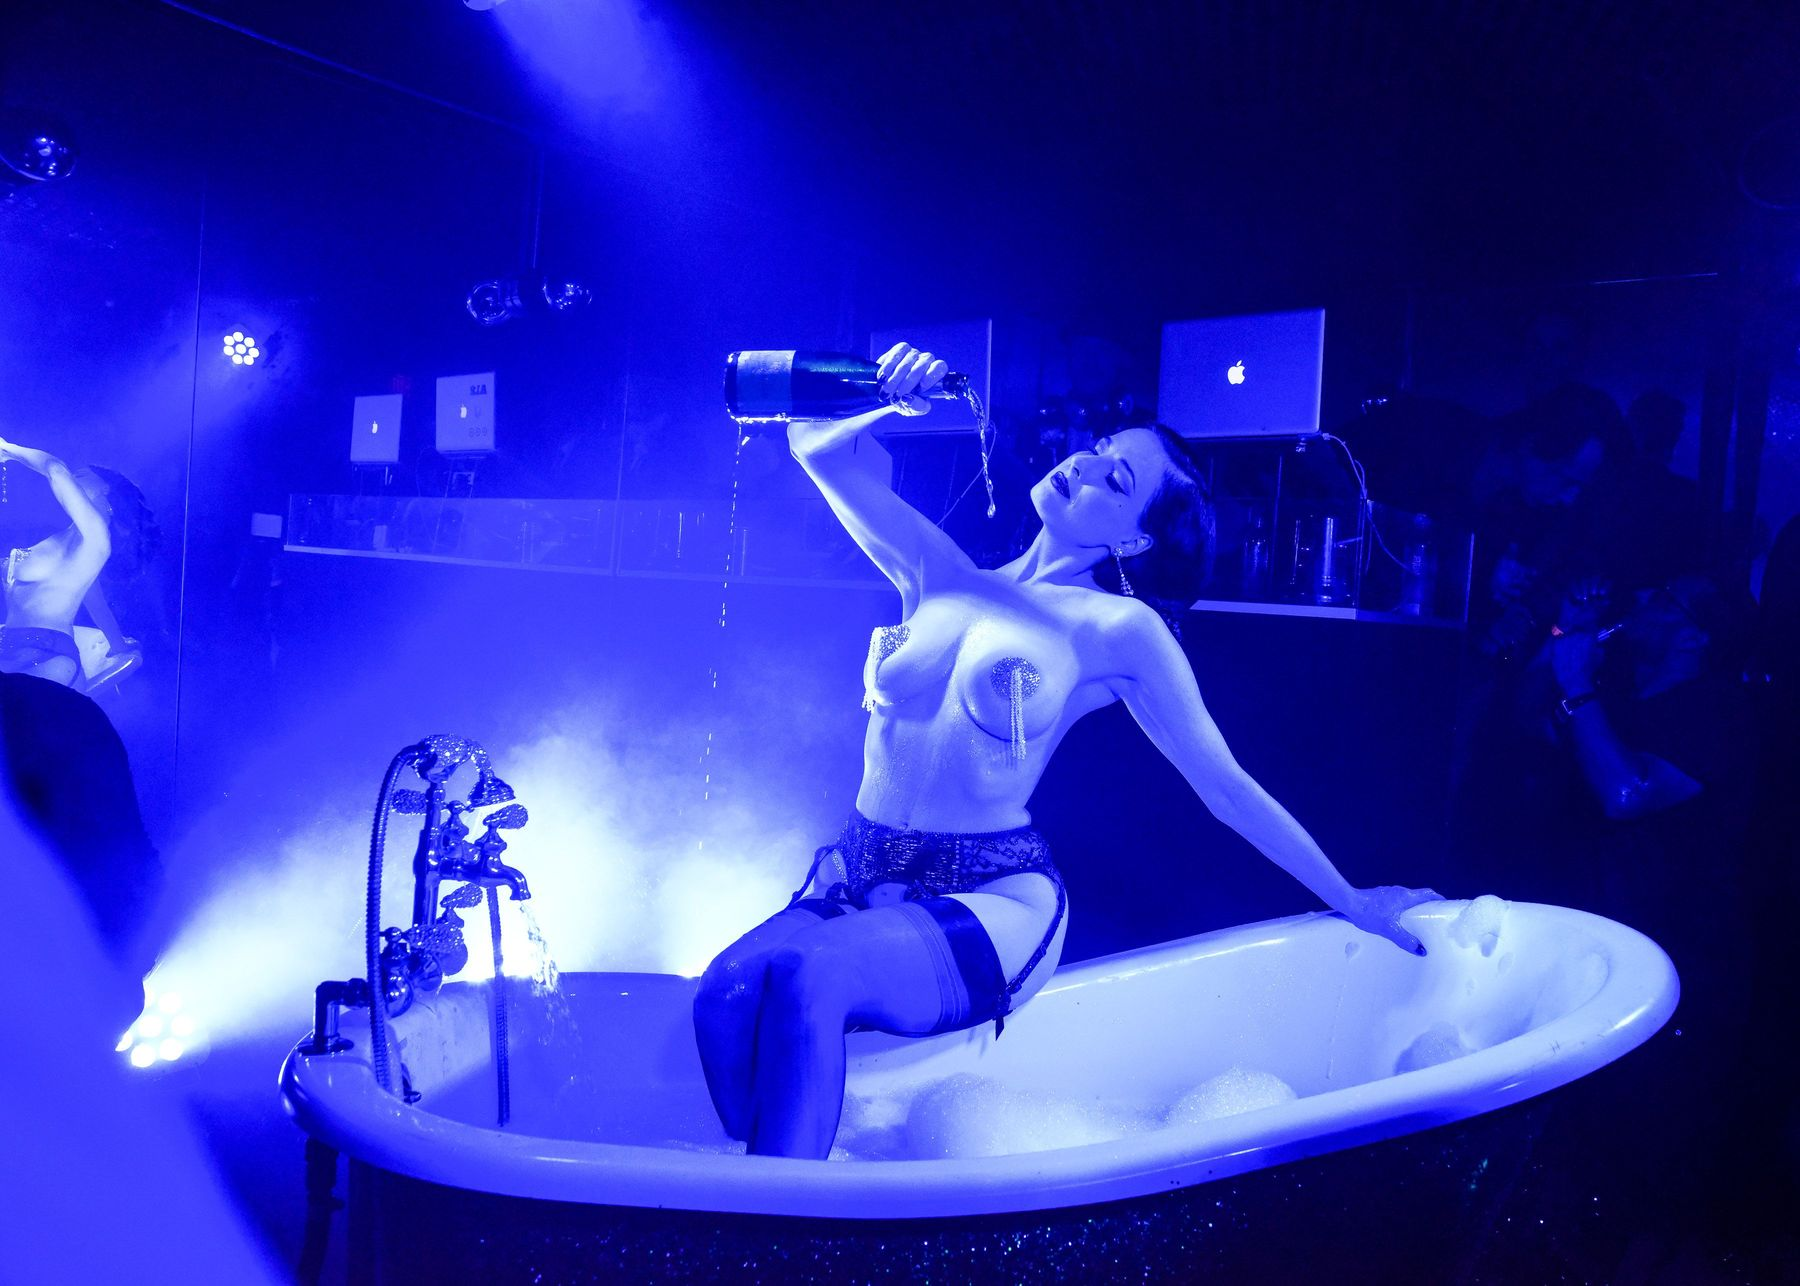 Dita-Von-Teese-Topless-1